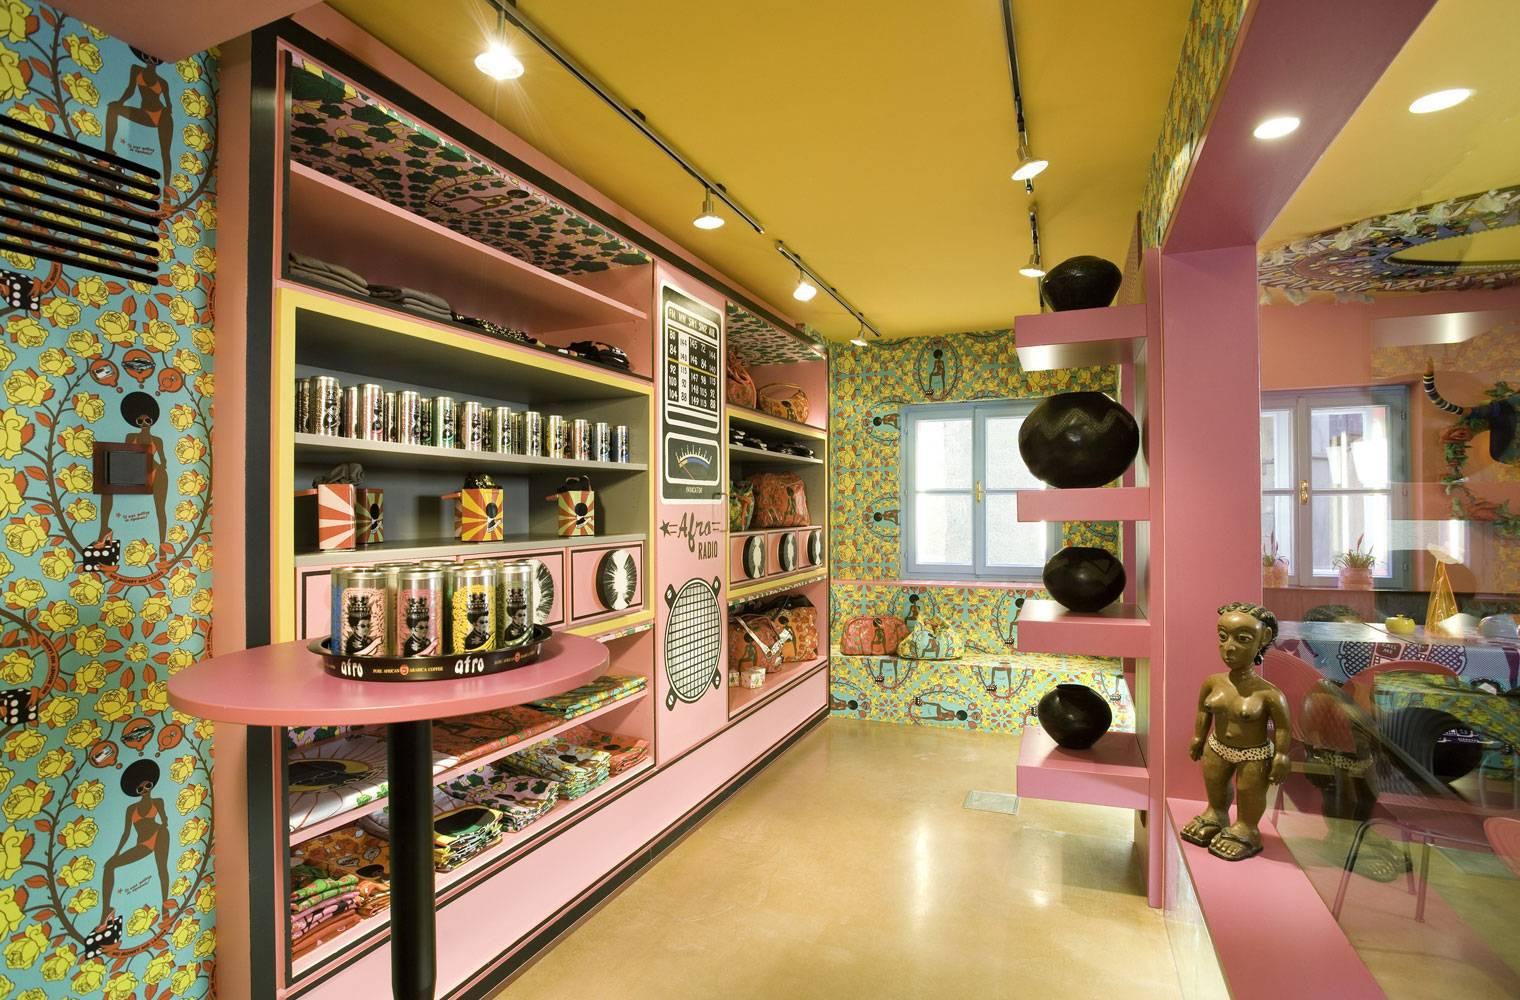 Afro Cafe, Saltzburg - Retail Section